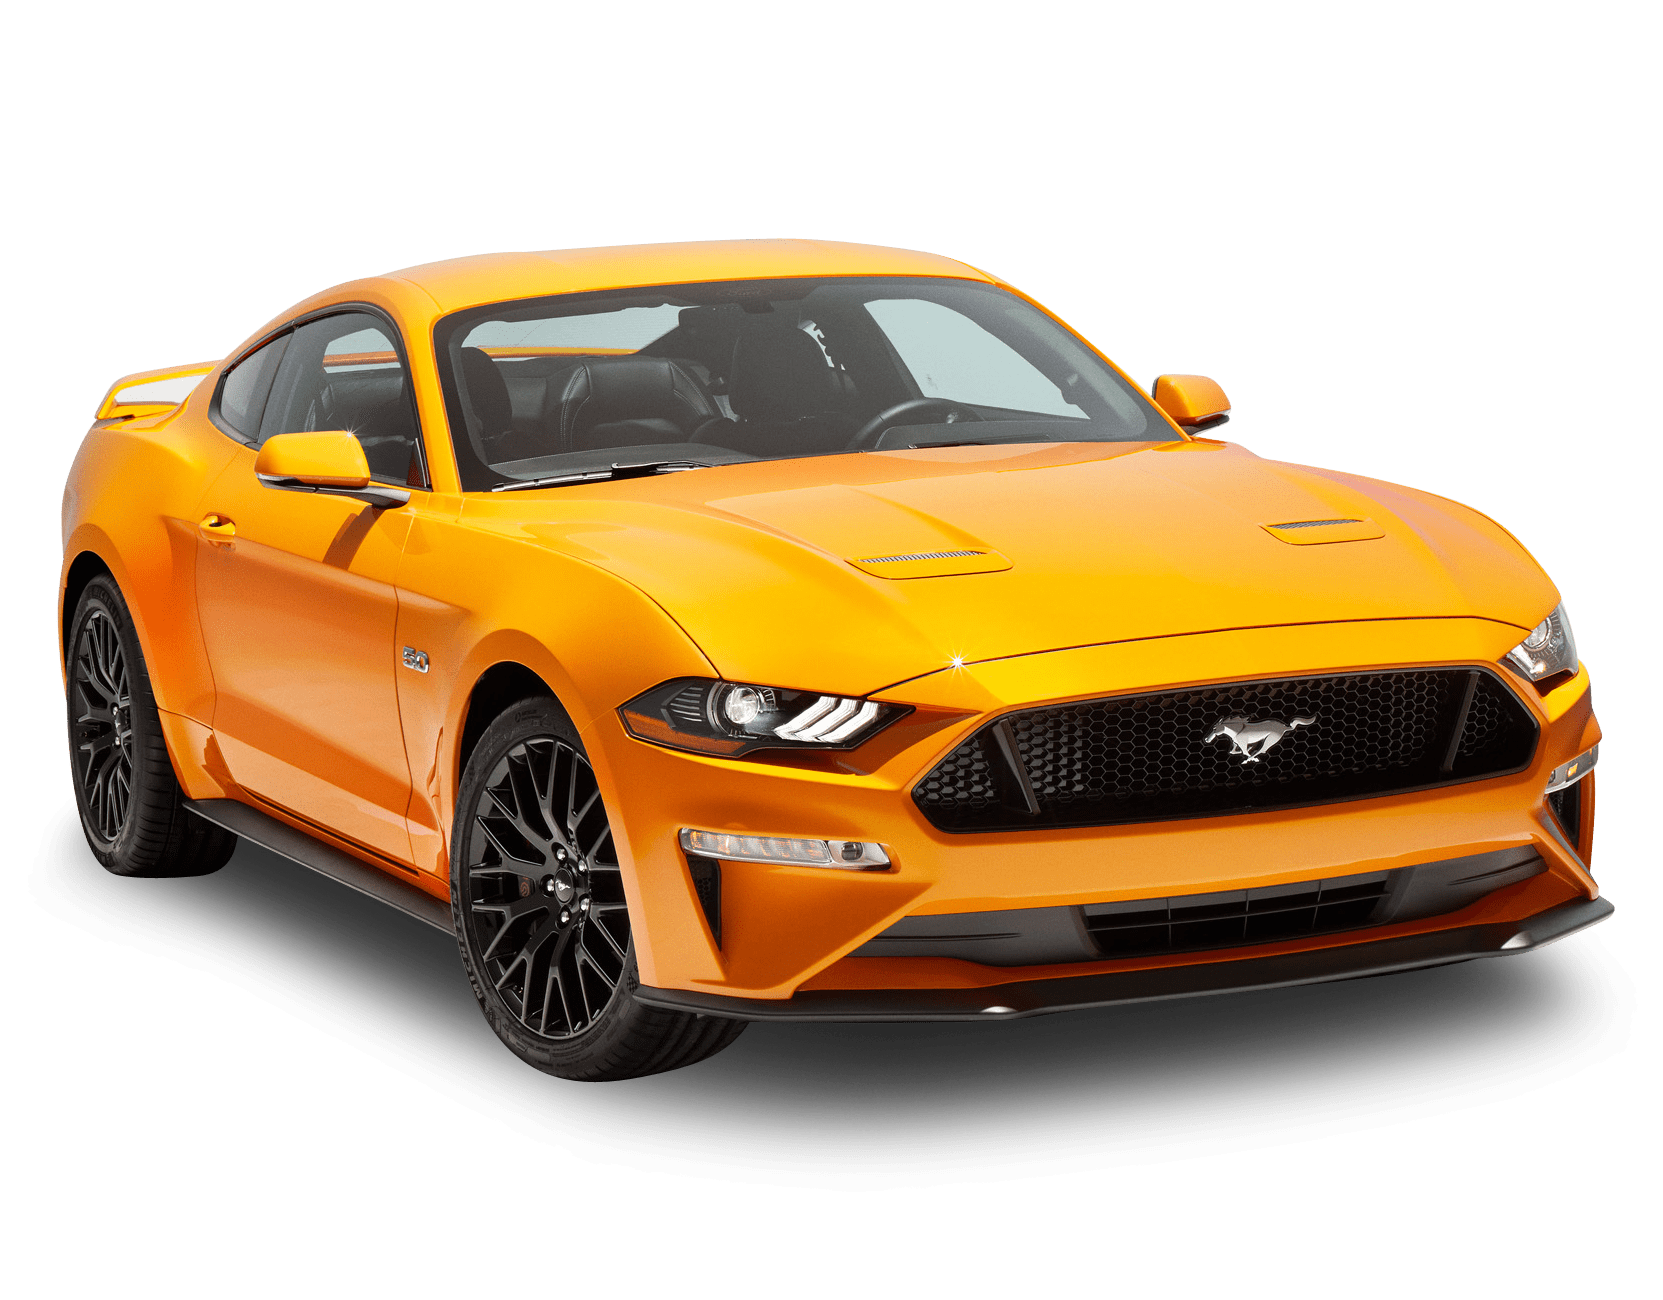 Mustang Car Pictures Www Pixshark Com Images Galleries